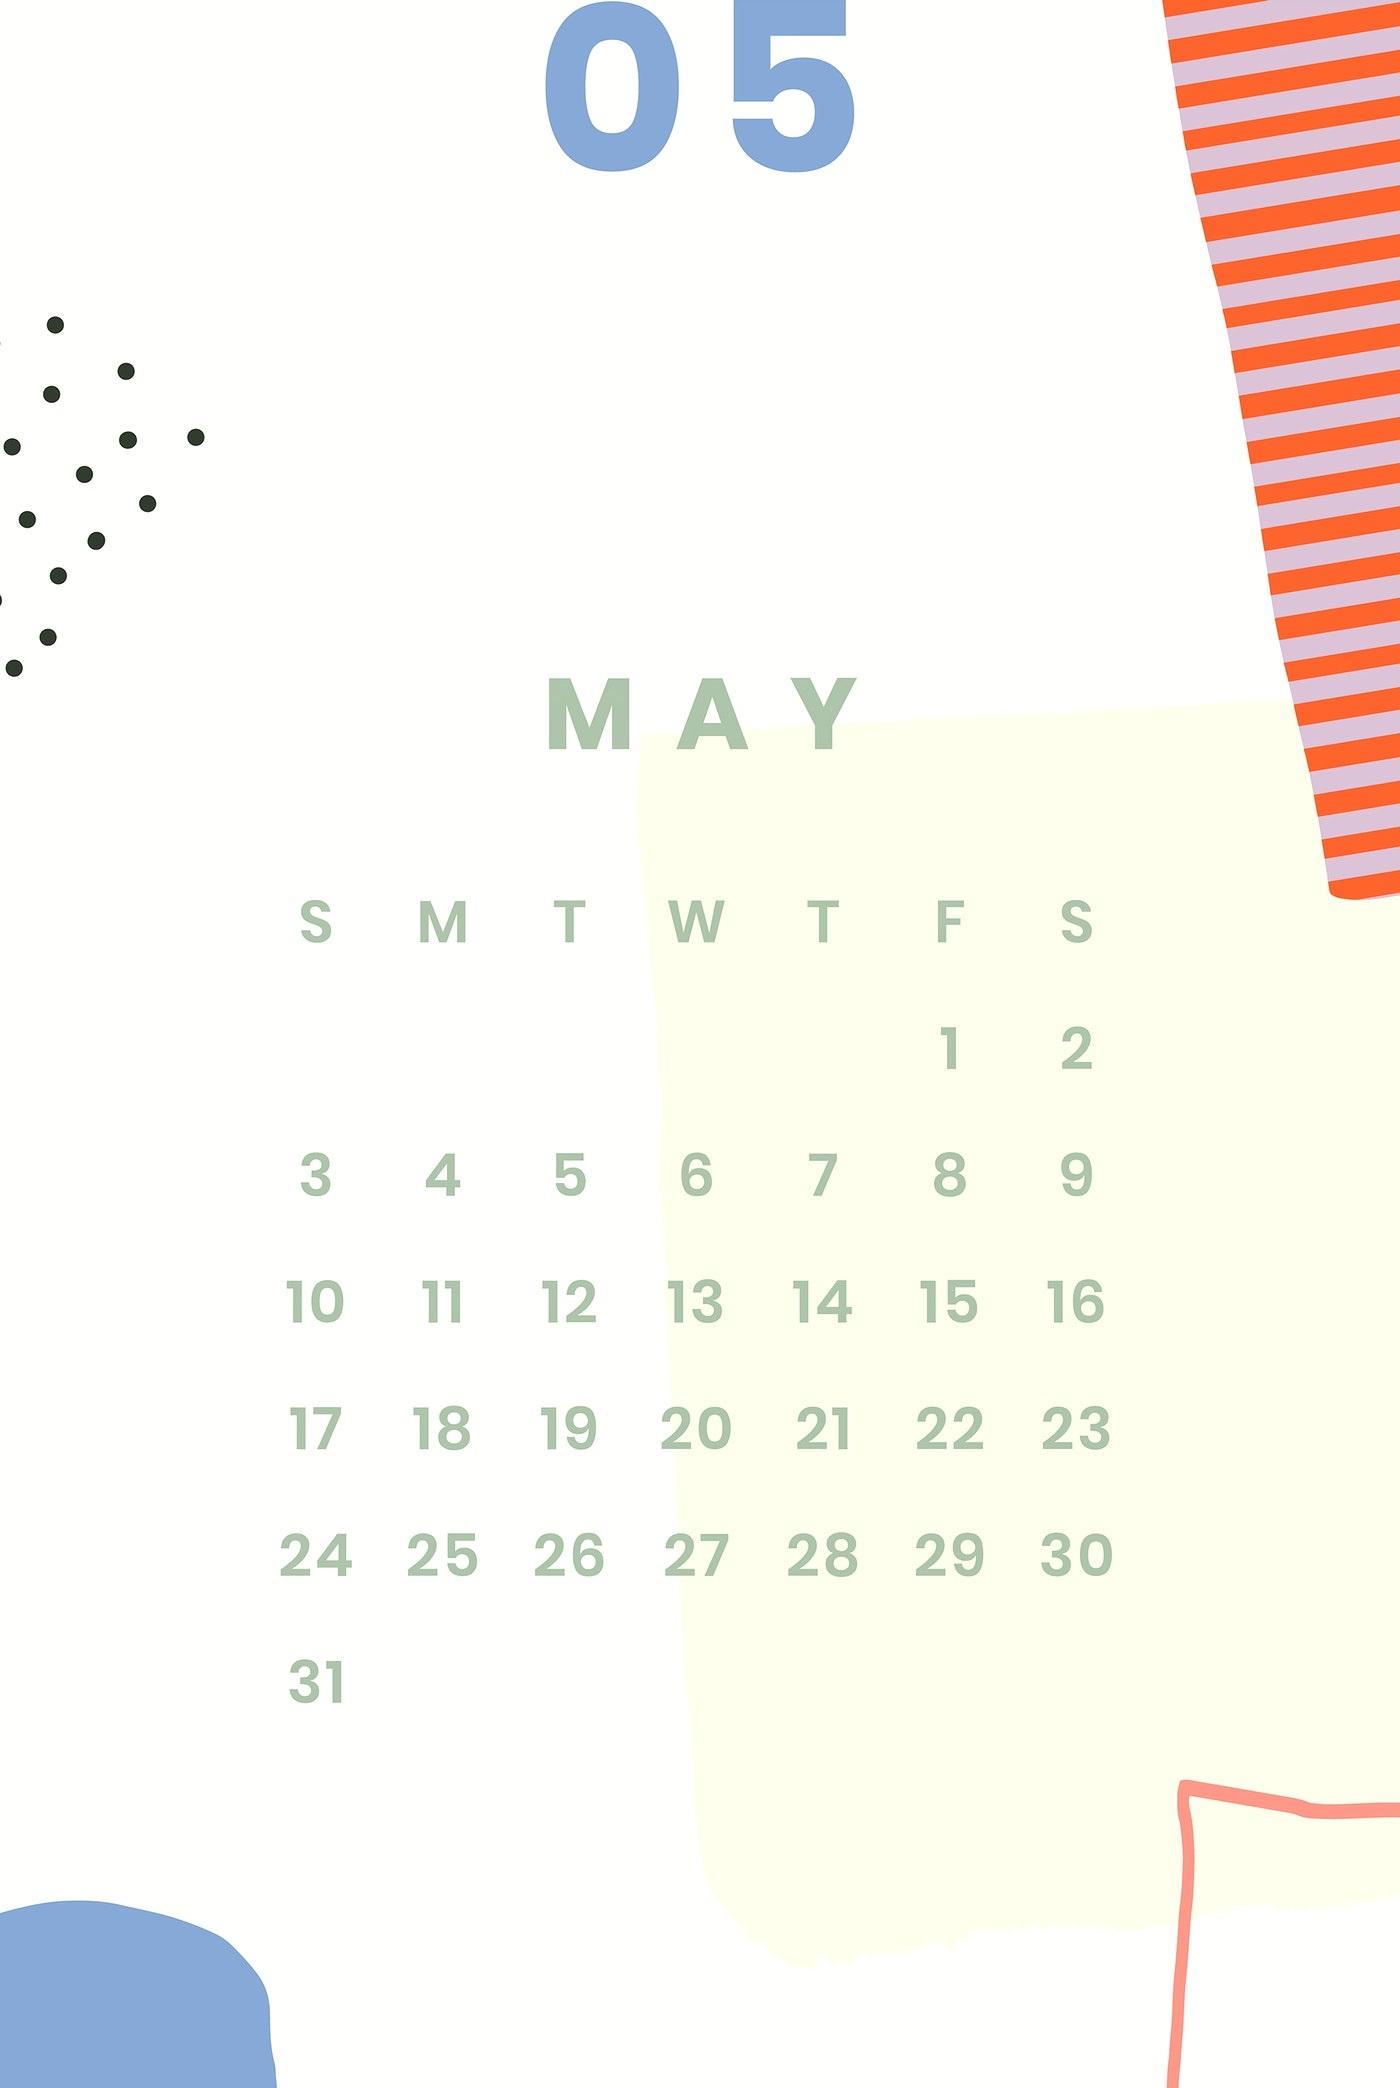 Iphone May 2020 Wallpaper Calendar | Calendar 2020